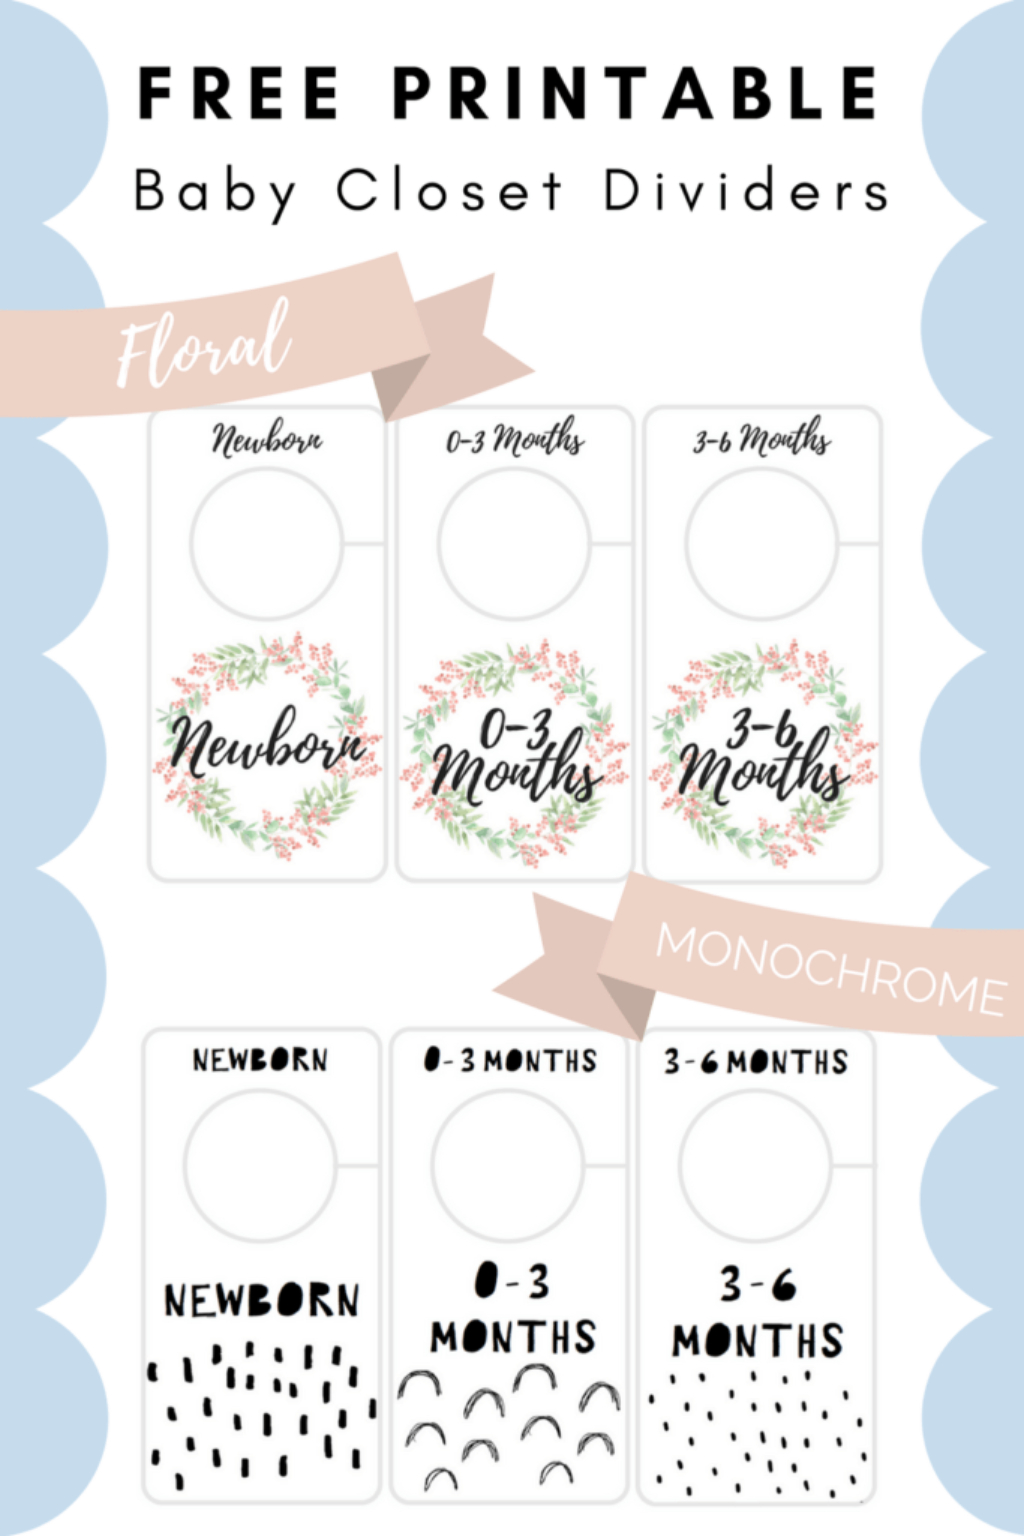 Free Printable Baby Closet Dividers Preemie To 24 Months - 2 Styles - Free Printable Dividers